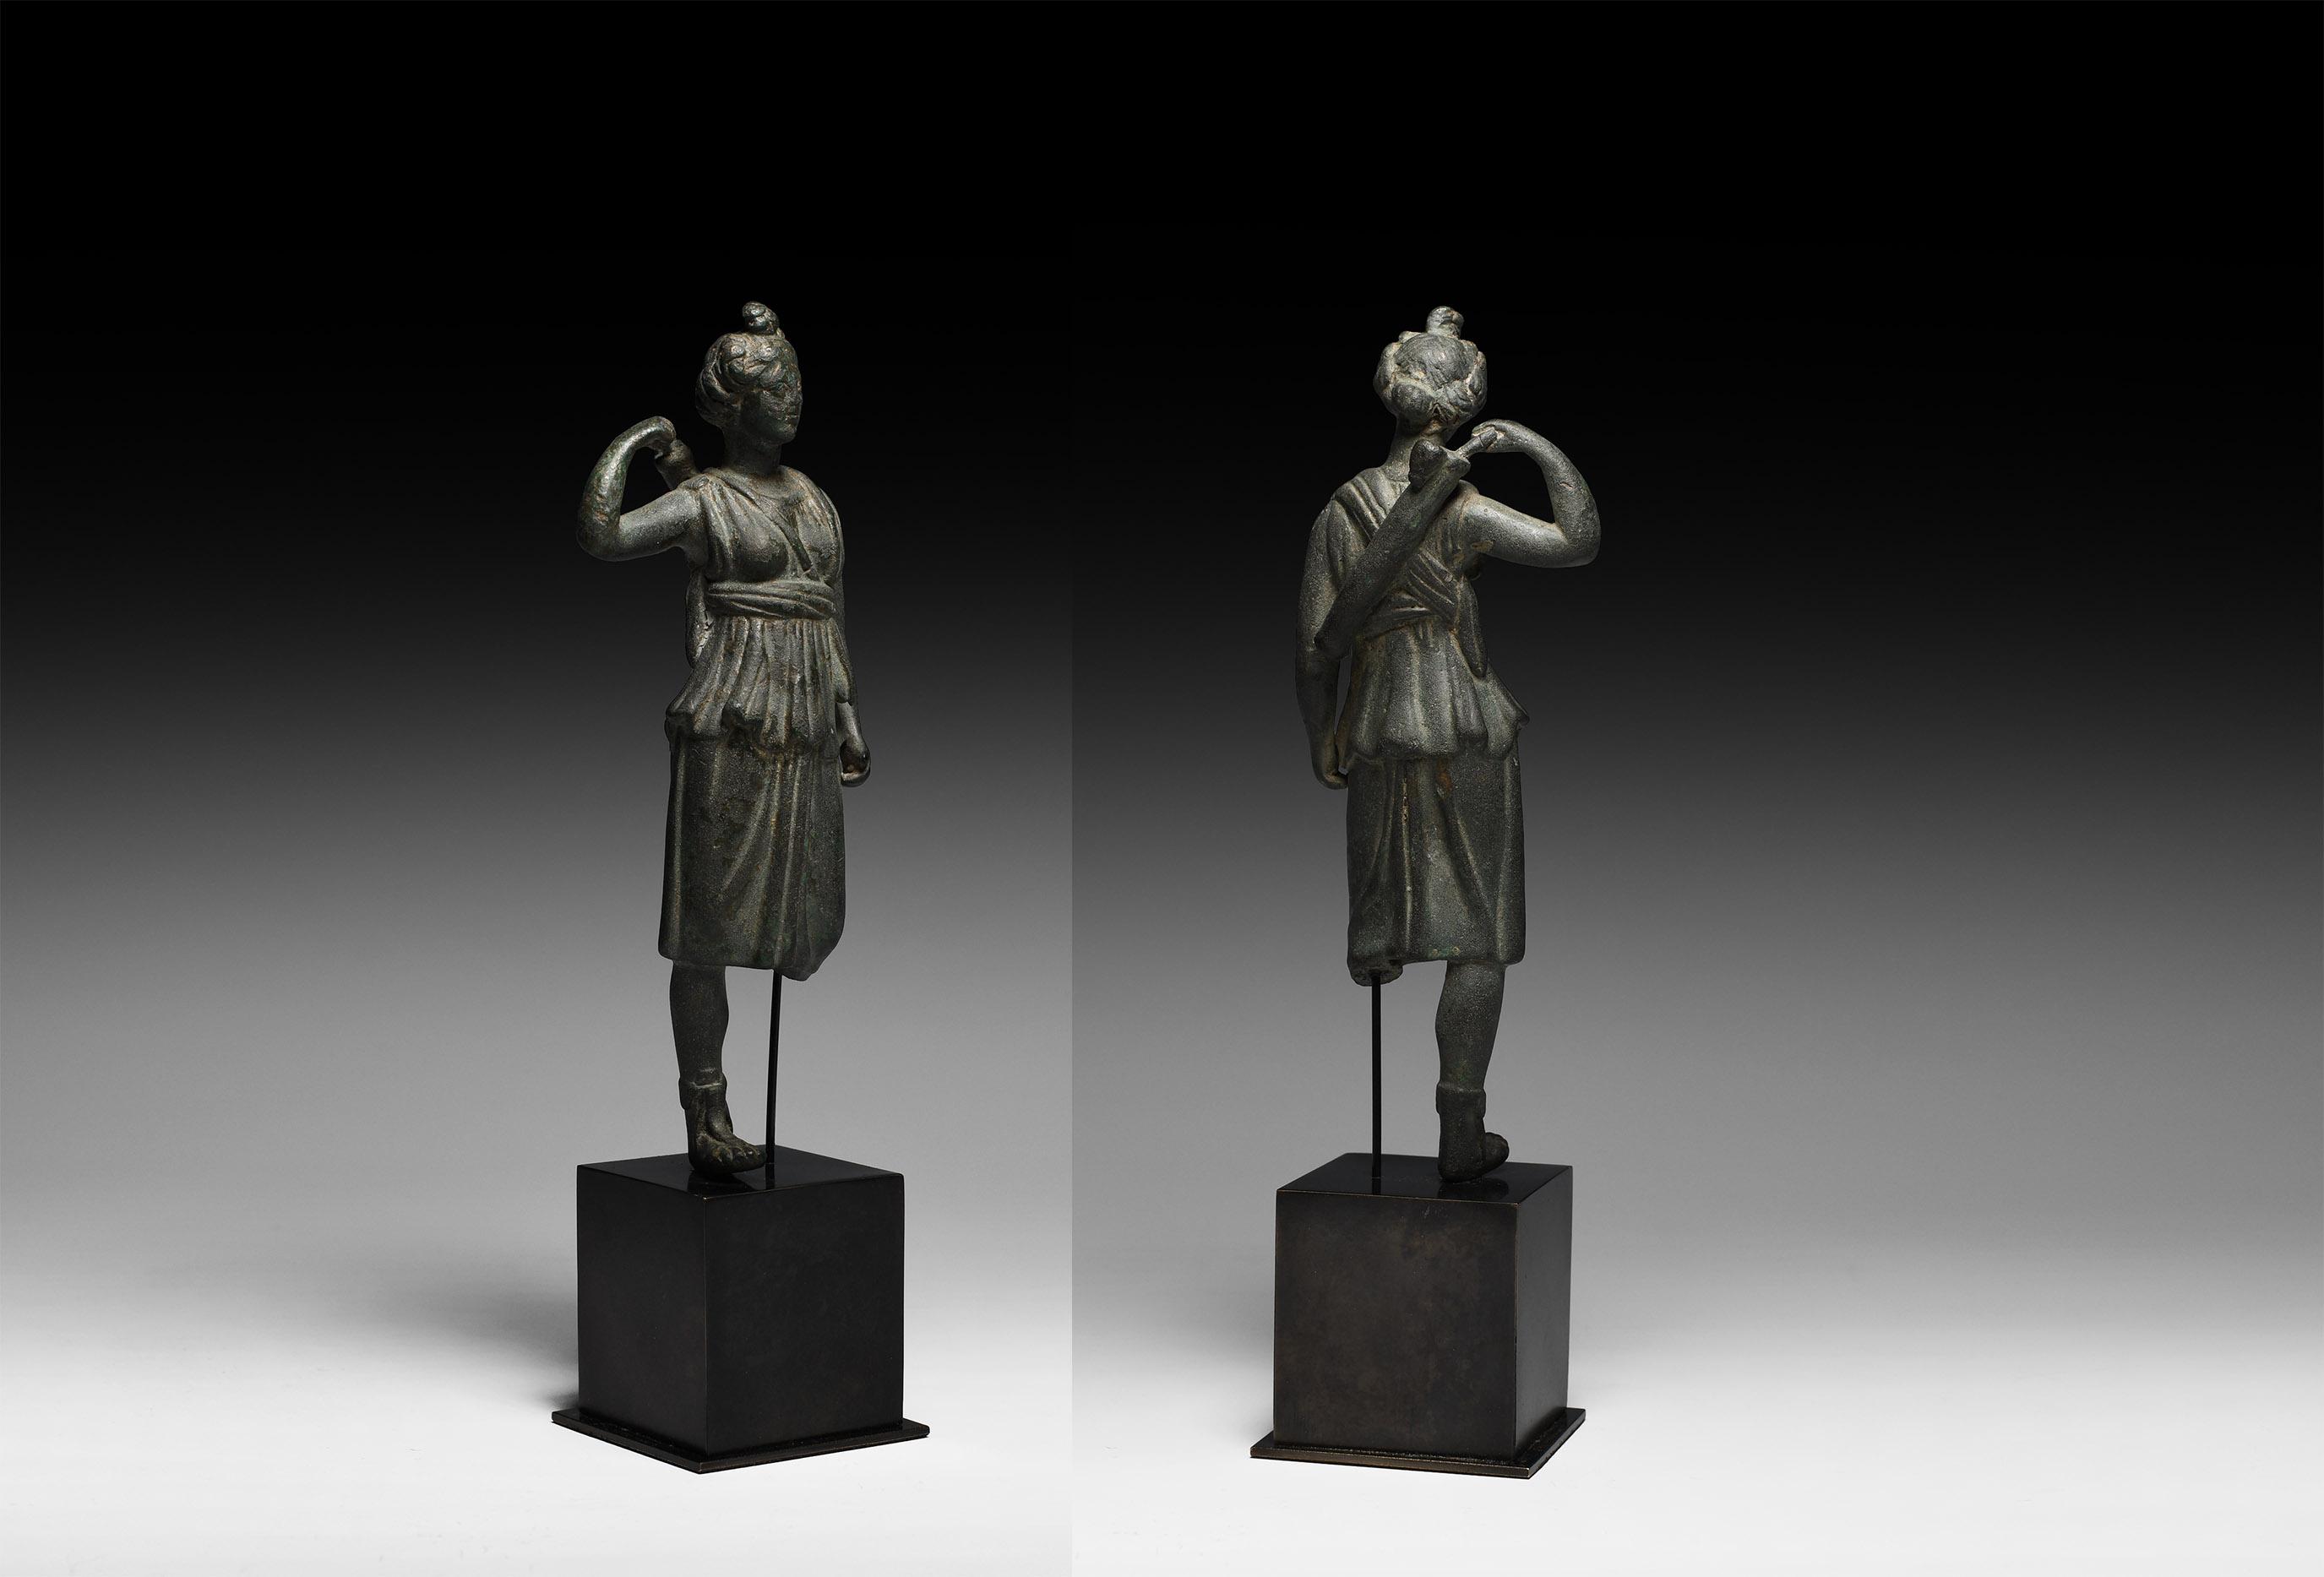 Roman Statue of Diana